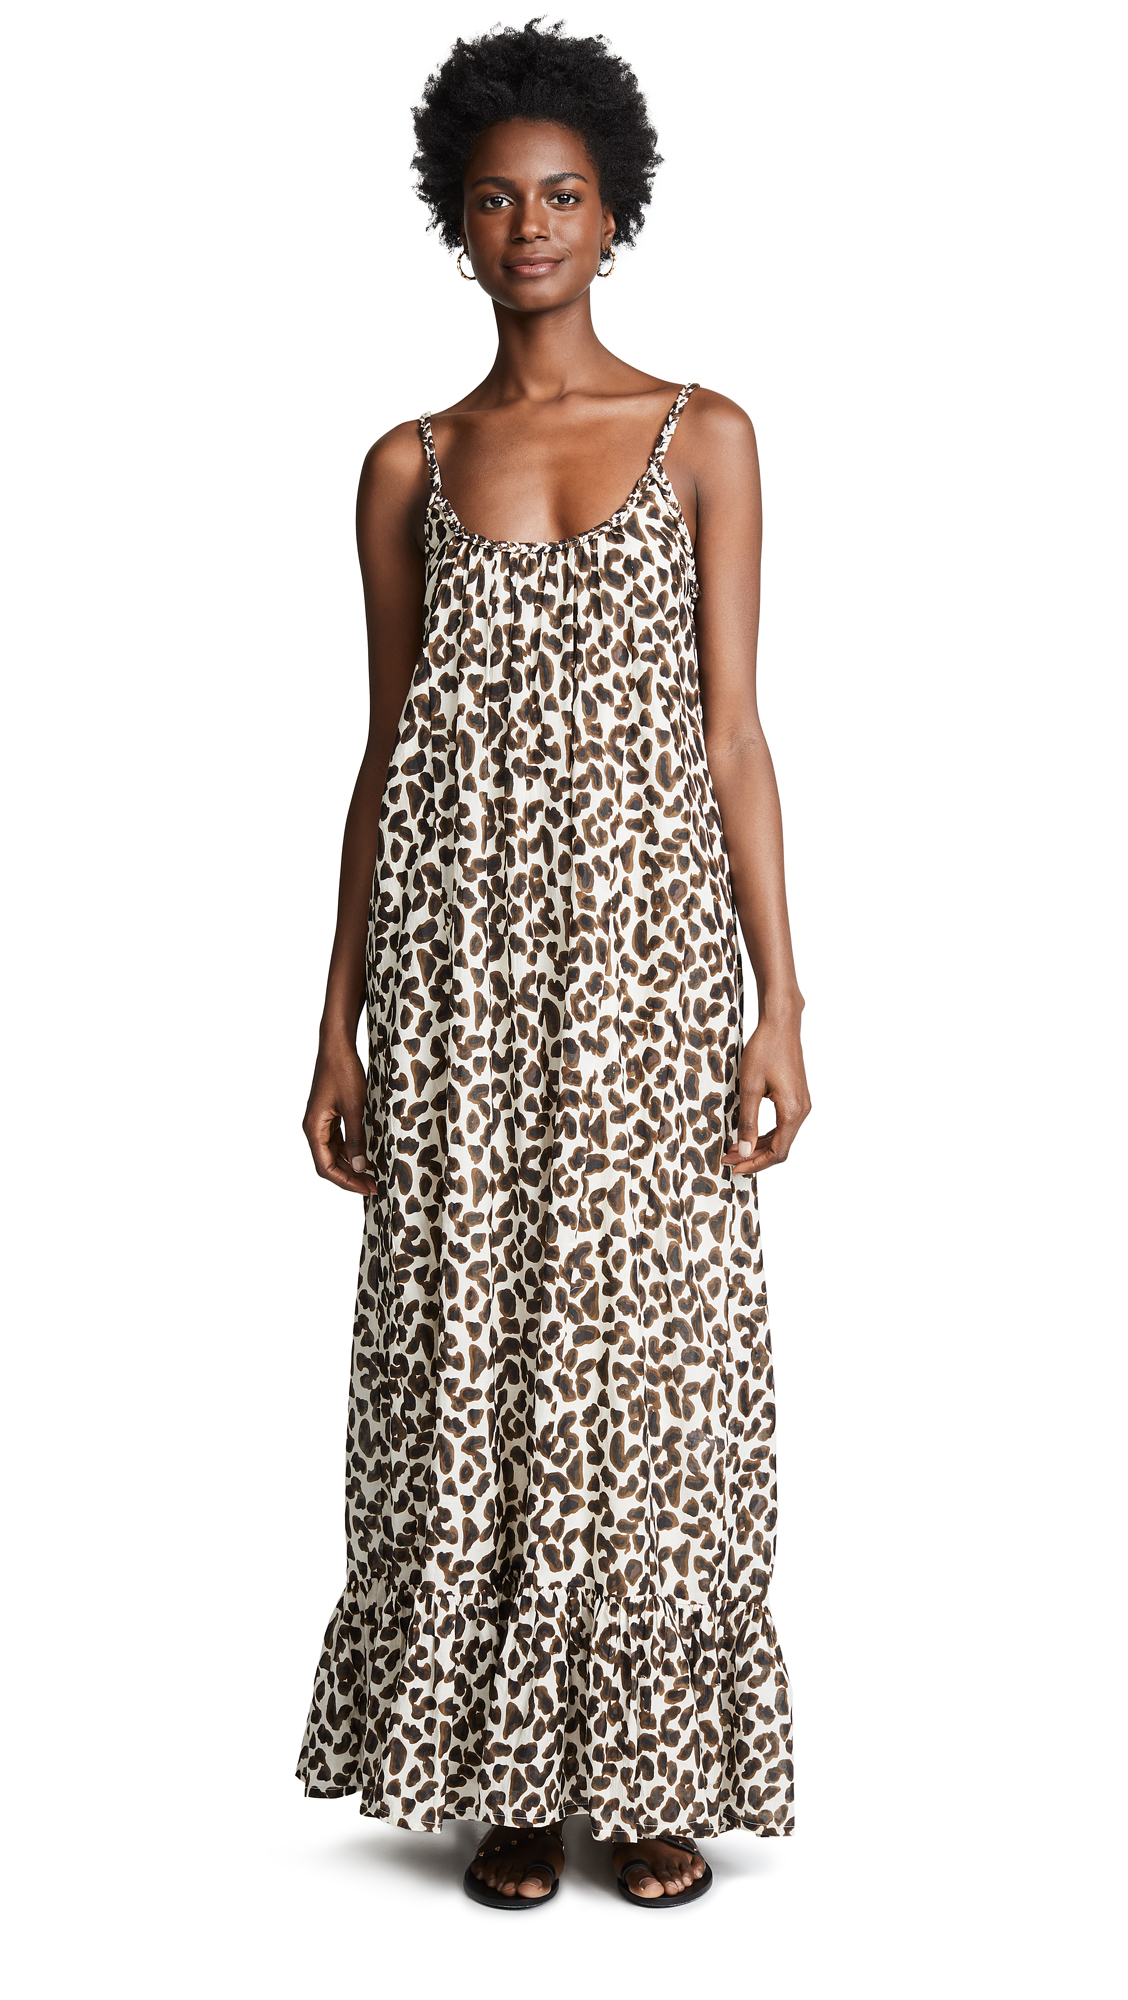 VETIVER Dance Away Sun Dress in Leopard